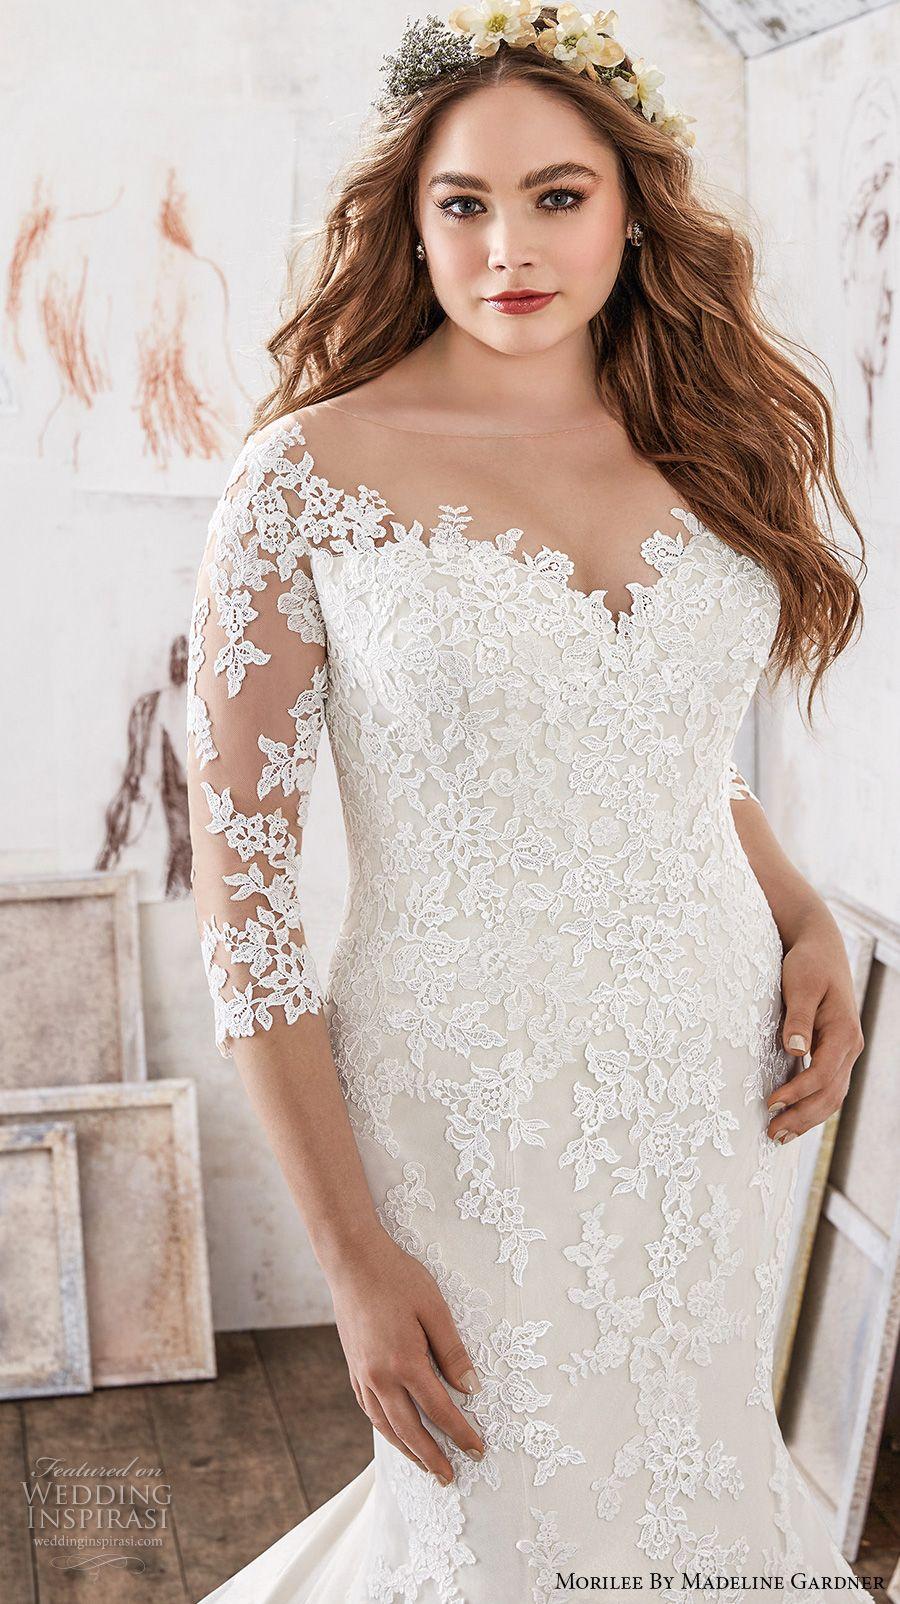 e62408300095b morilee julietta spring 2017 bridal three quarter sleeves sweetheart  neckline full embellished romantic classic princess plus size mermaid wedding  dress v ...